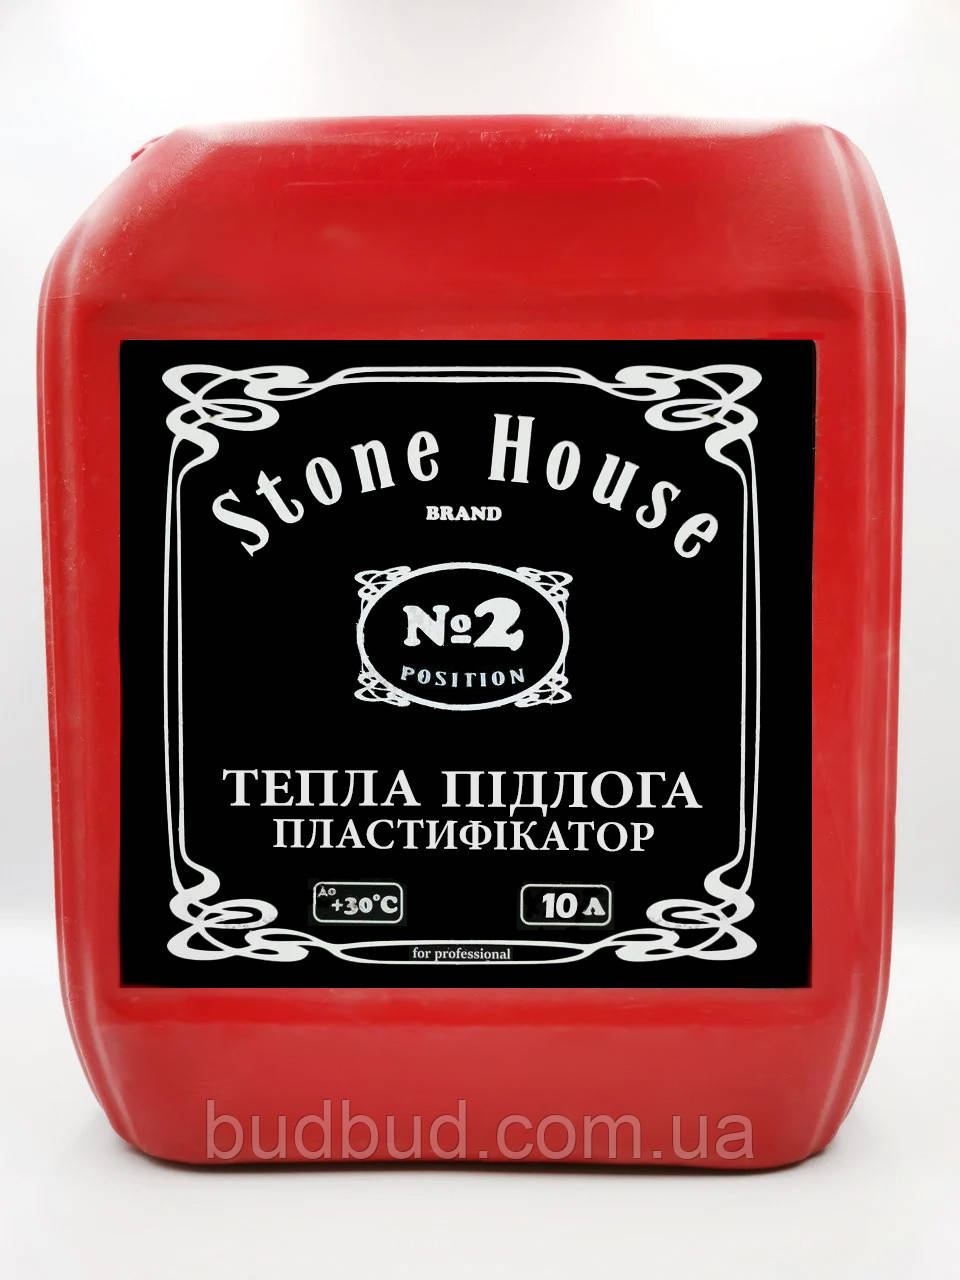 Пластификатор ТМ «Stone House» №2  Для теплых полов 10л.